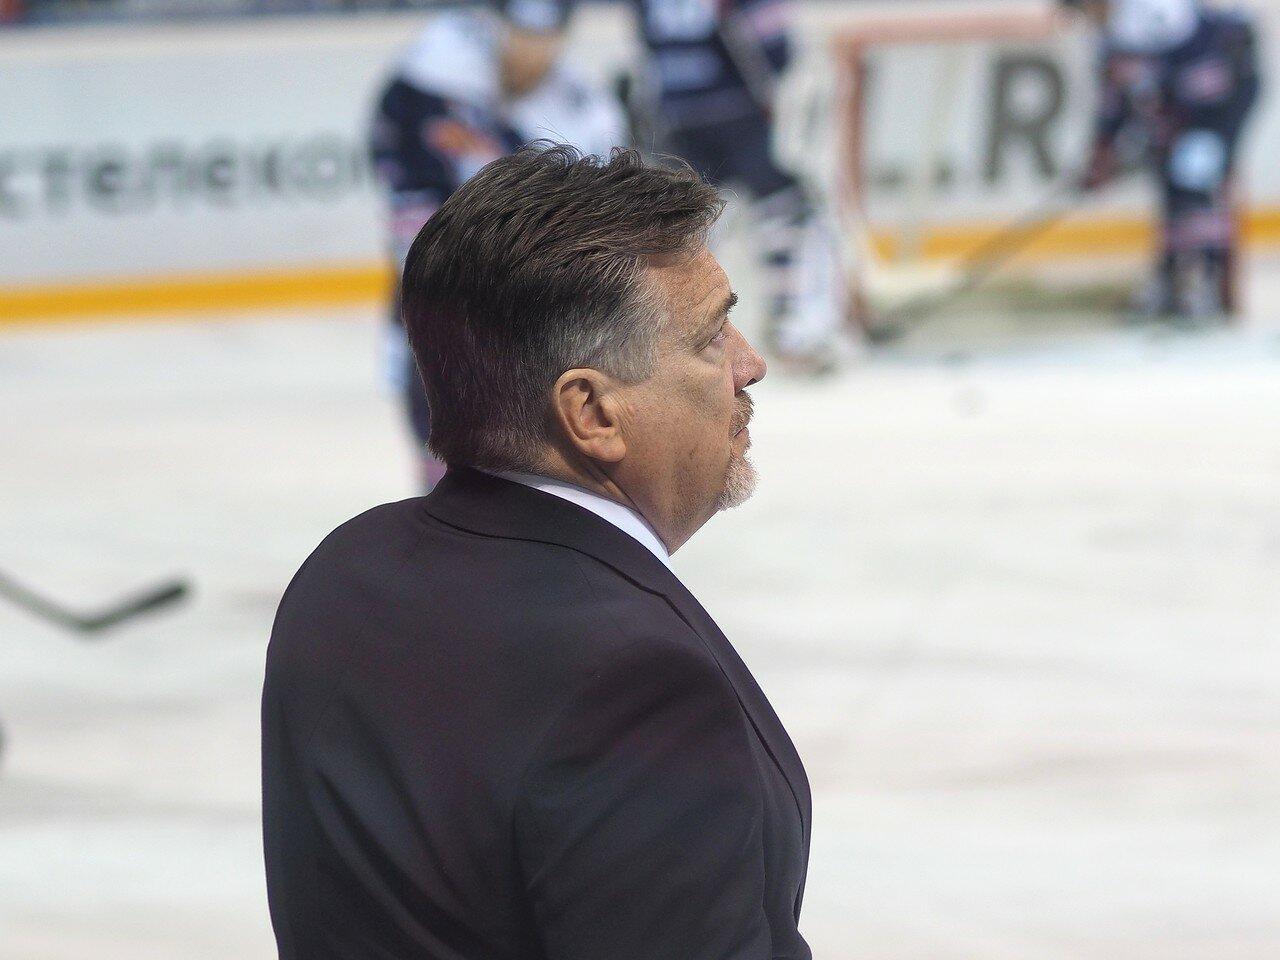 21Плей-офф 2016 Восток 1/2 Металлург - Сибирь 10.03.2016